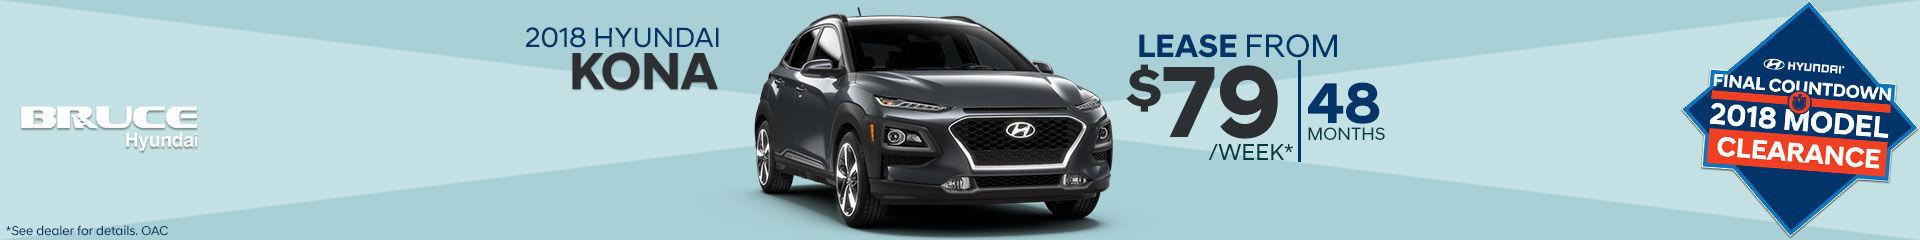 Lease the 2018 Hyundai Kona